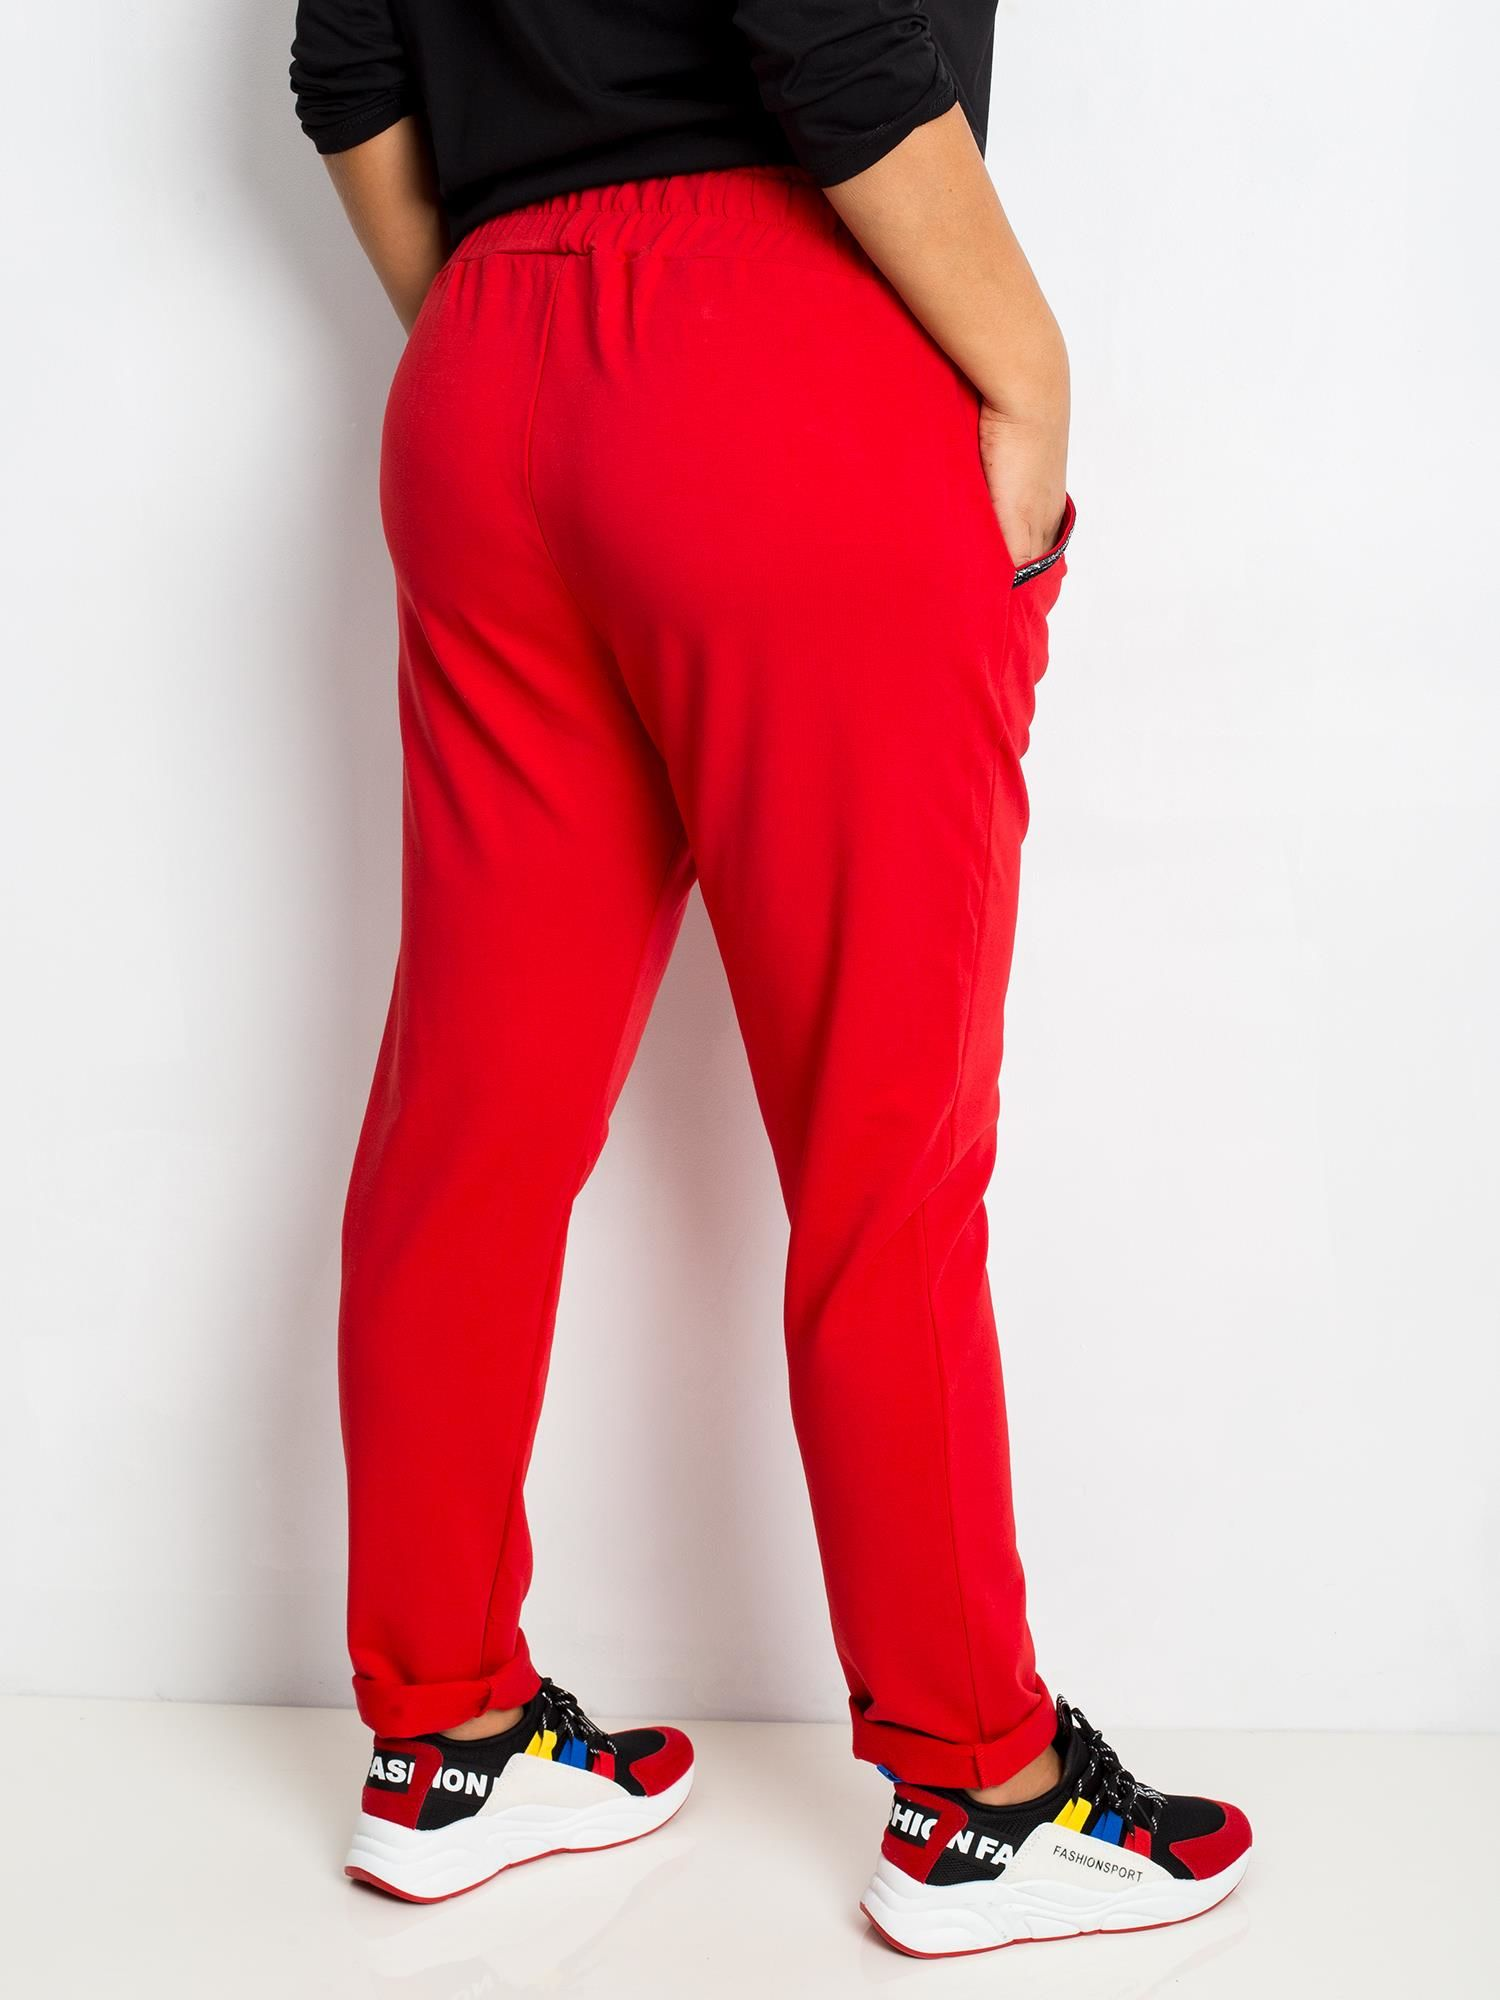 Joggpants in Rot mit Glitzerstreifen Rückansicht